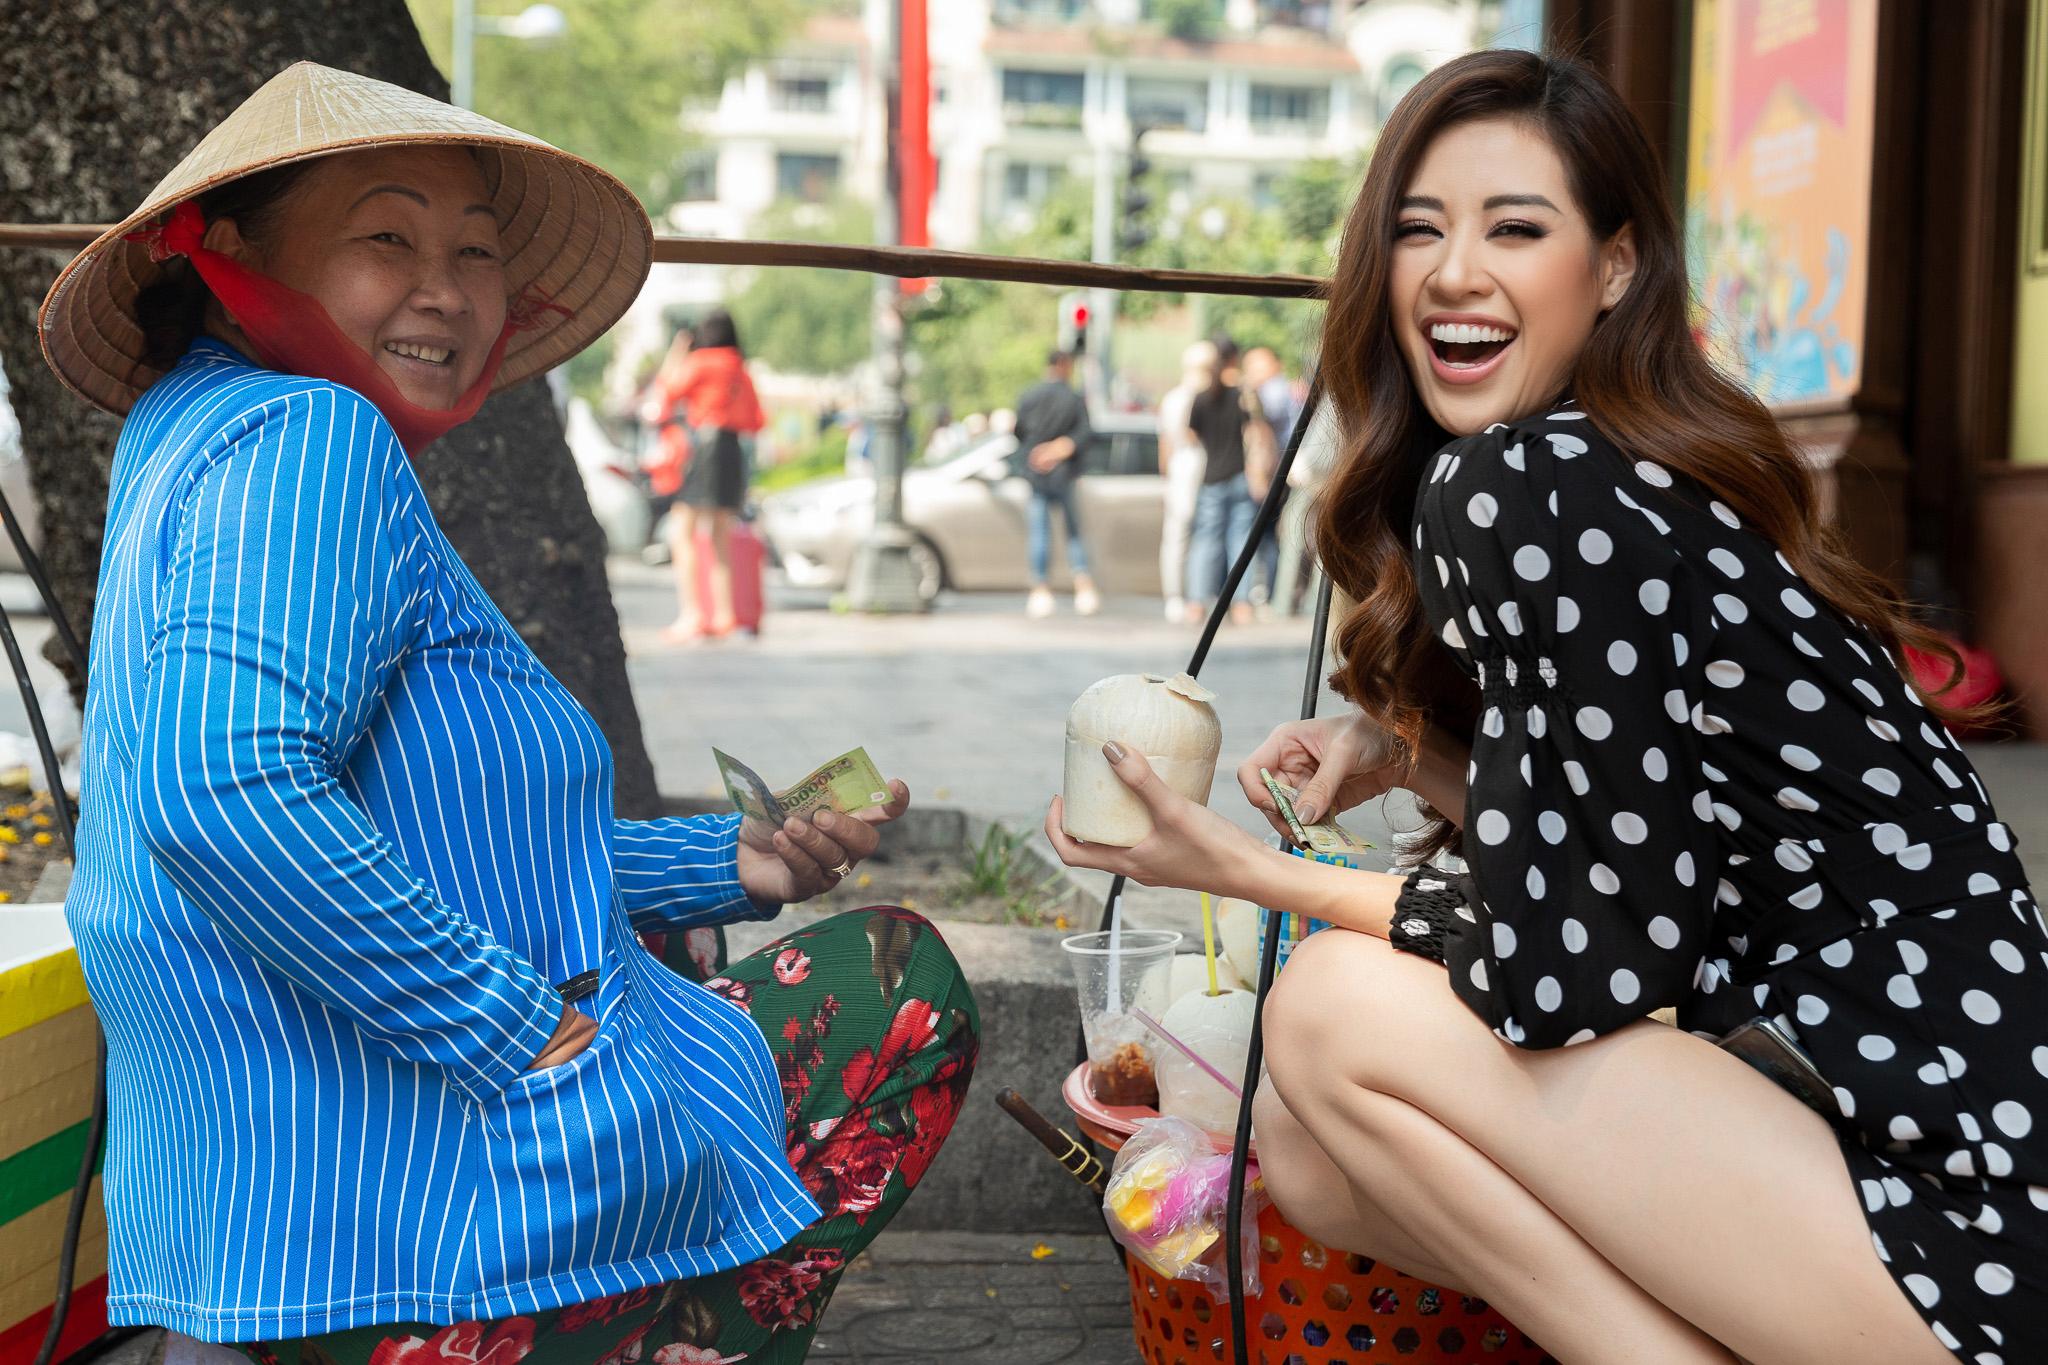 Hoa hau Khanh Van_Hoa hau Hoan Vu Viet Nam 2019 (20)